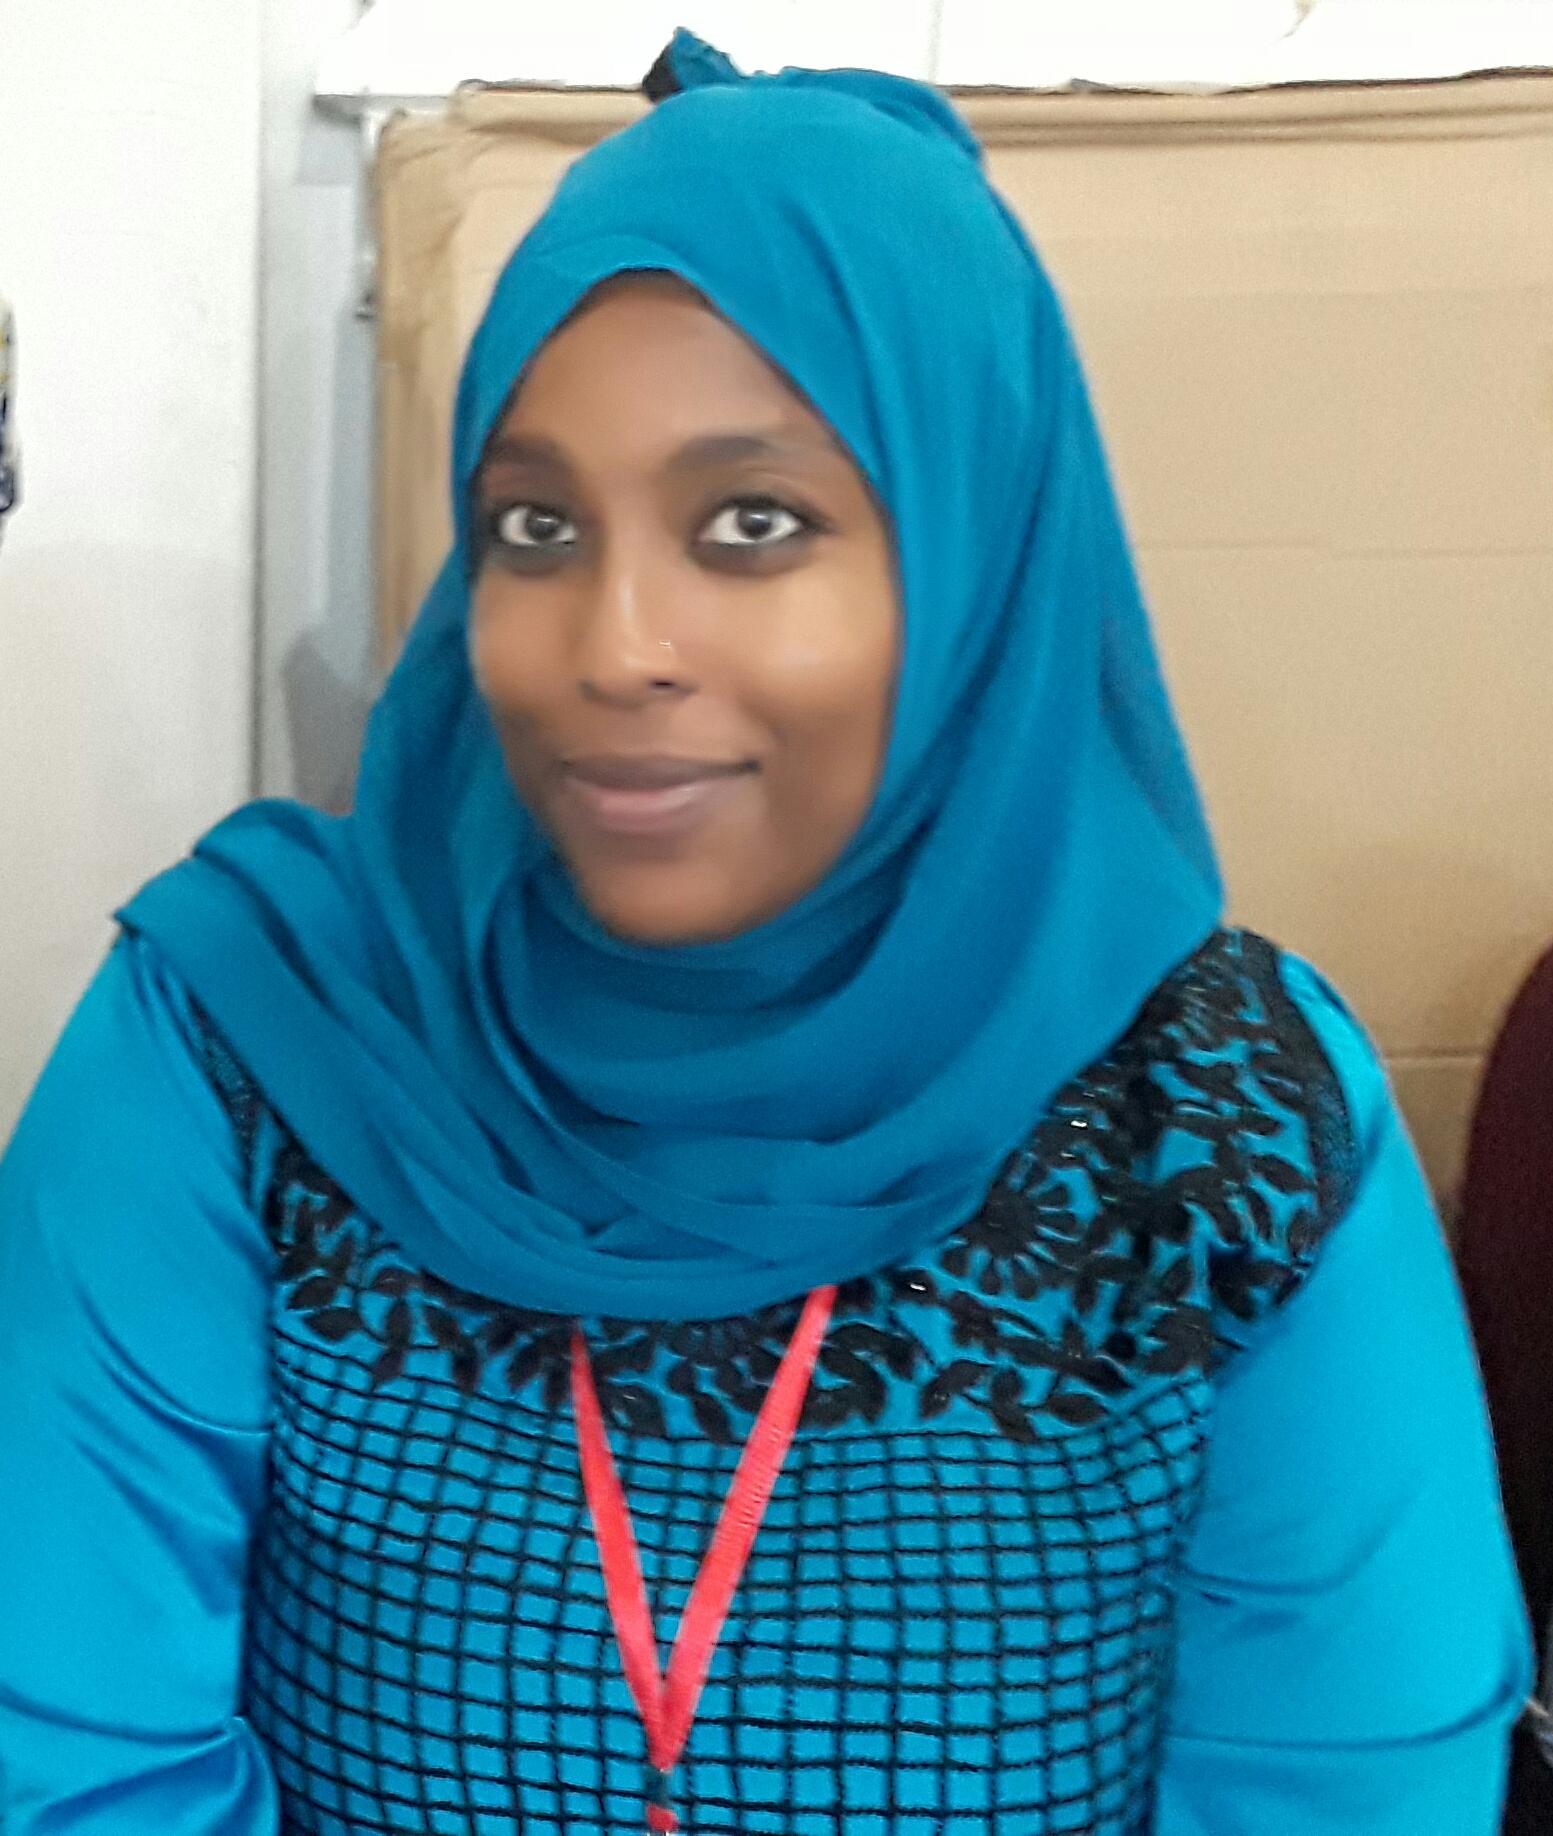 Mariam M. Abdu, Program Manager for TOLERANCE Project IMC. Phone: 08064354819, E-mail: mariamabdu3@gmail.com